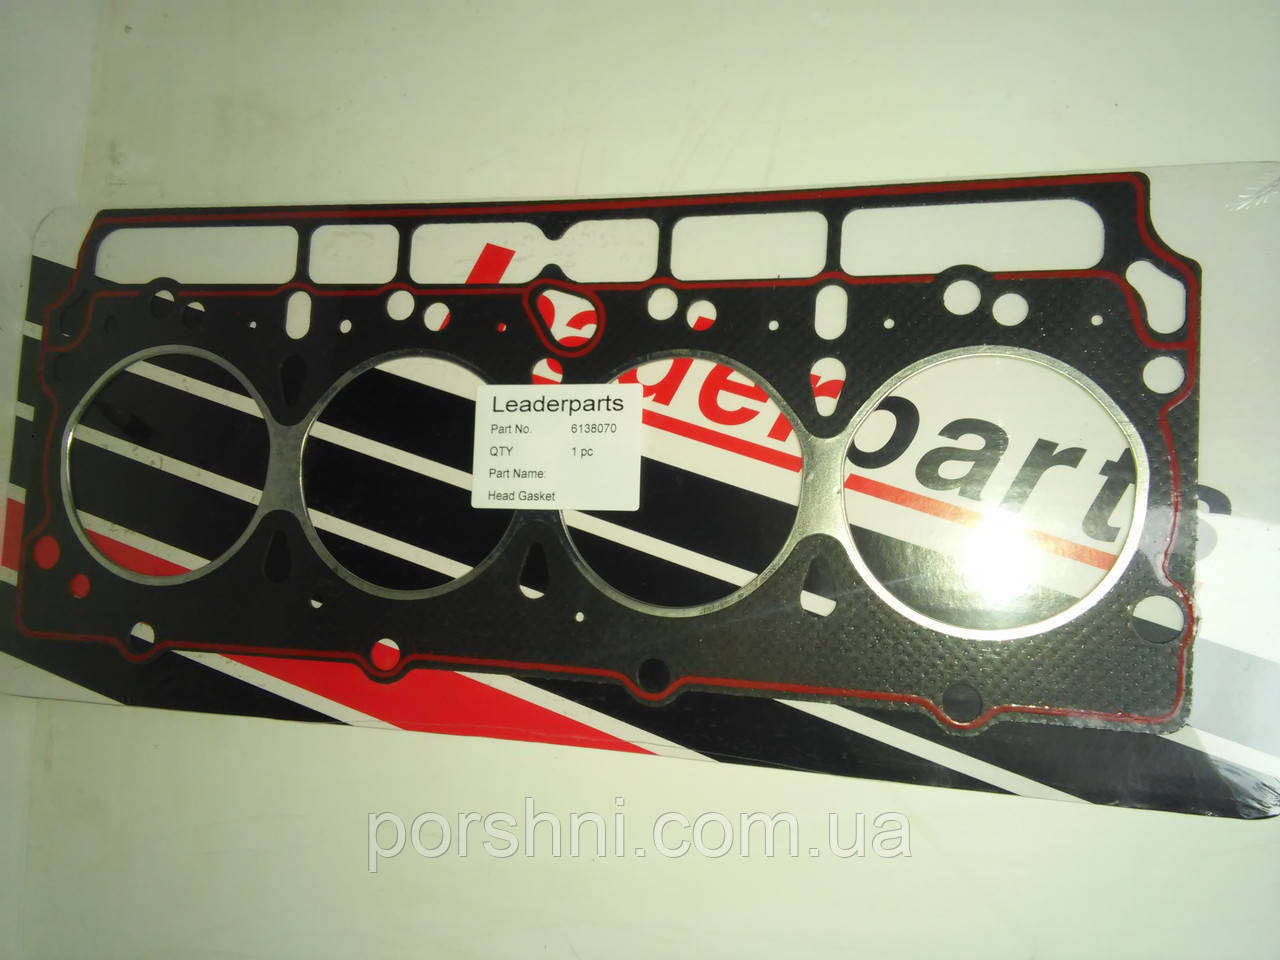 Прокладка  головки Ford  Тransit  2,5 D     Leaderparts 6138070